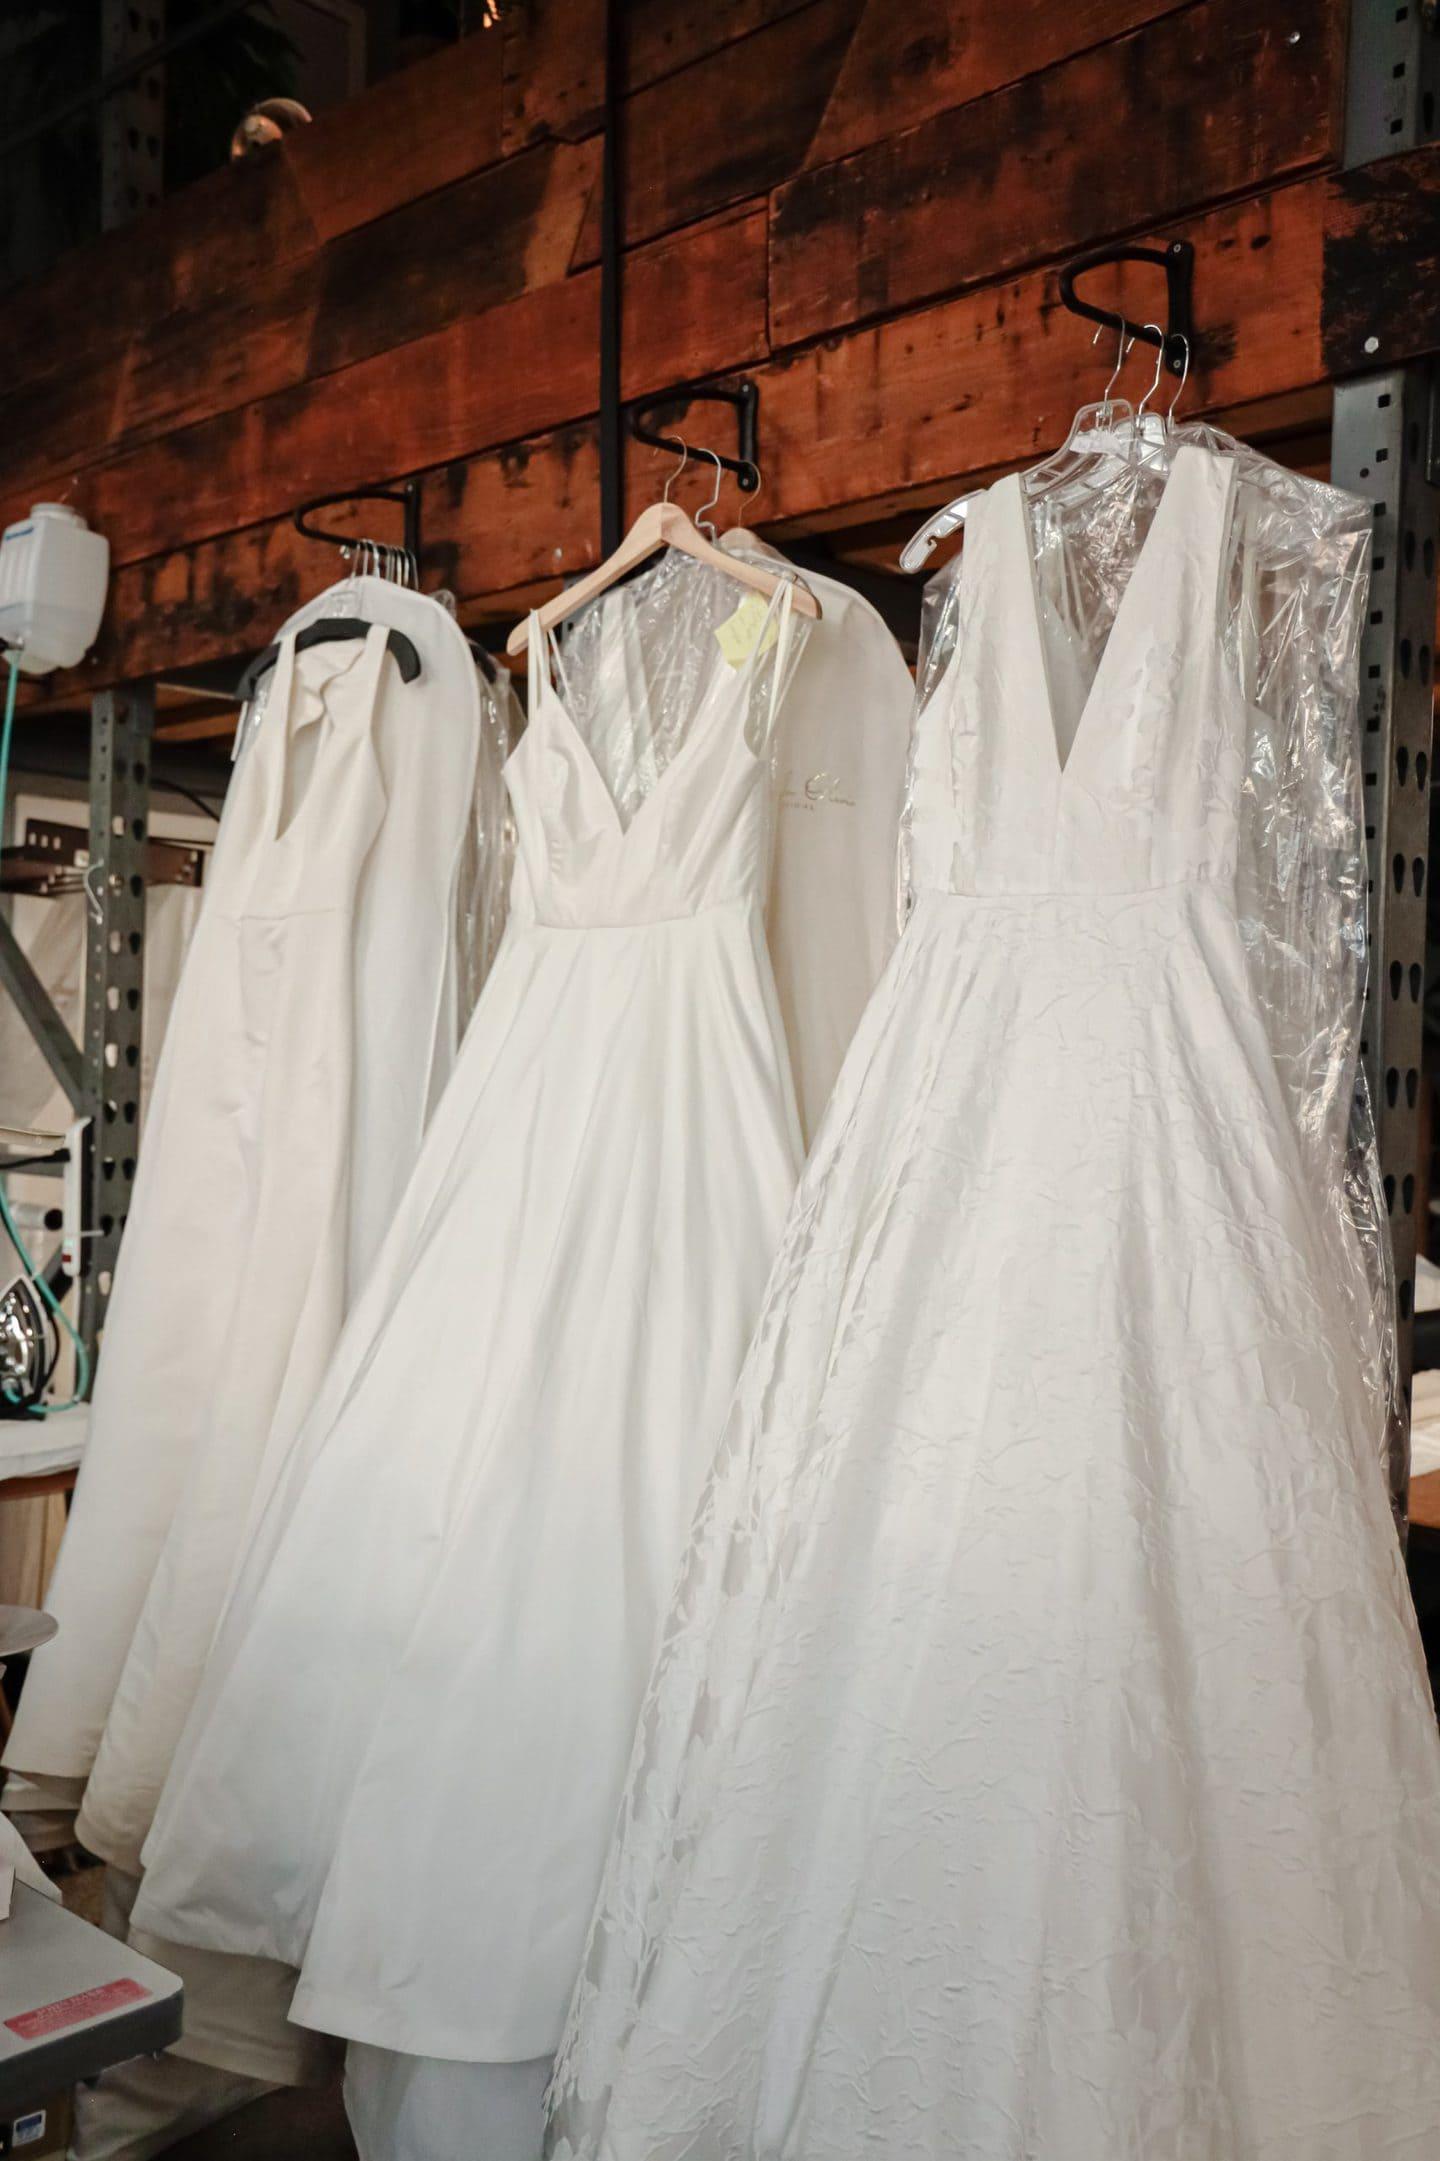 Three wedding dresses hanging on racks at a clothing manufacturer